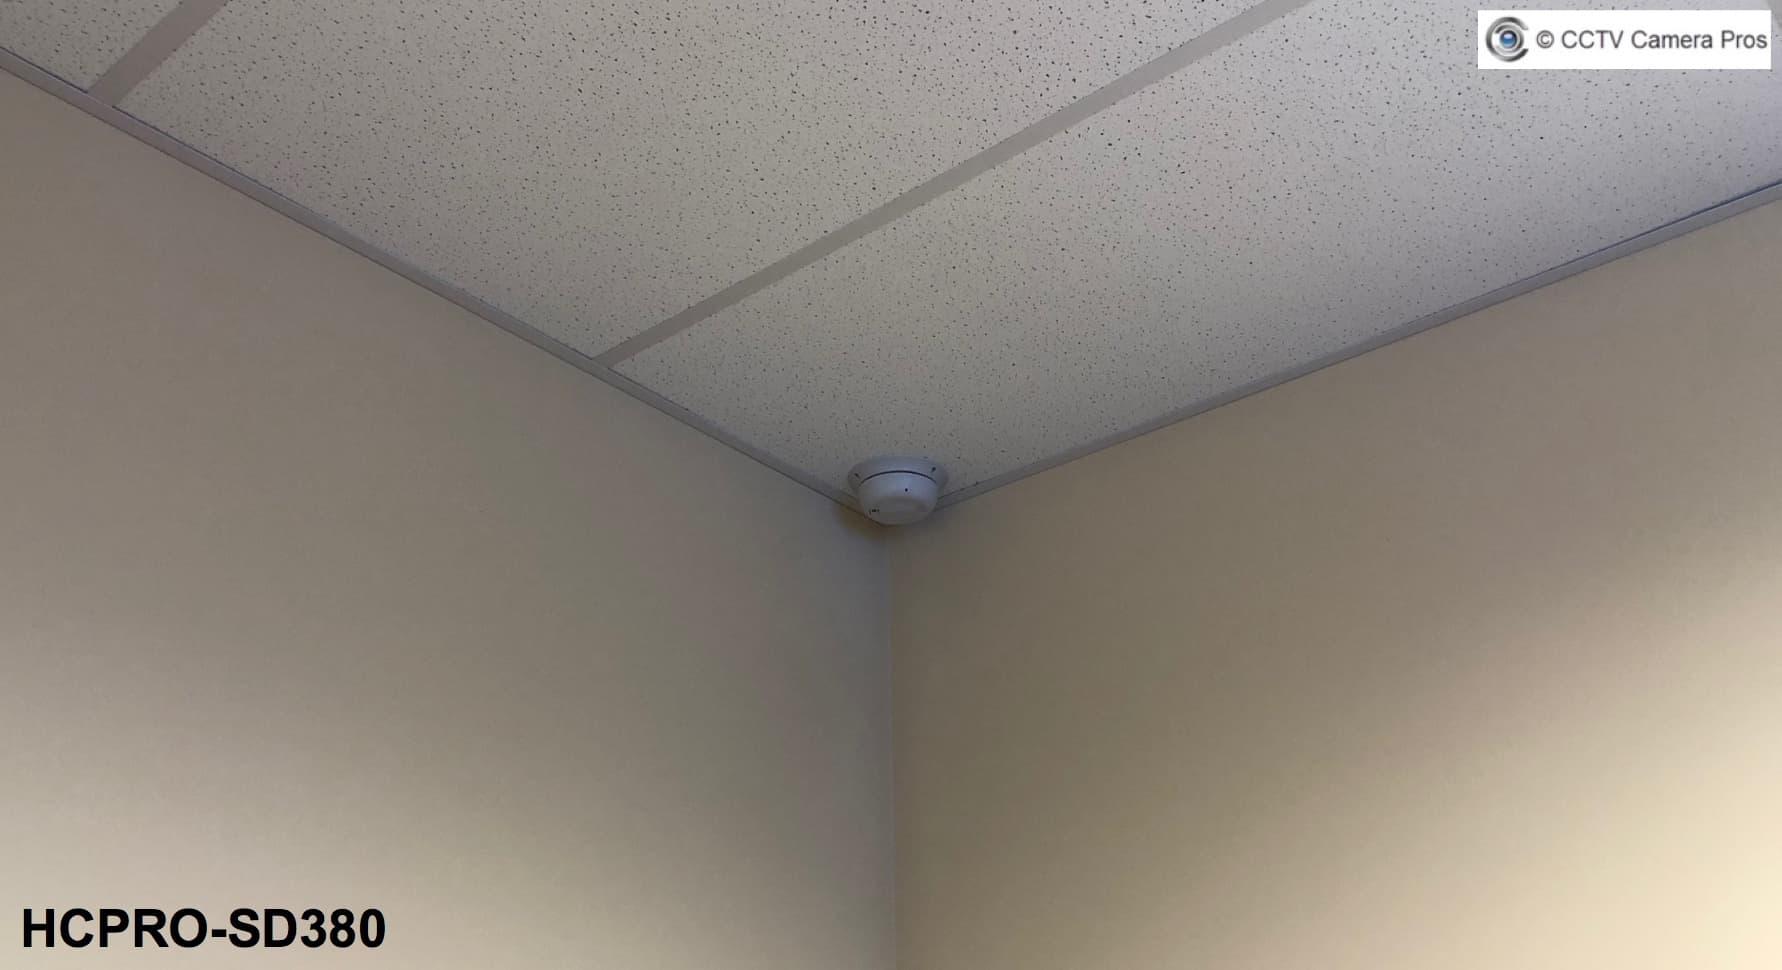 Surveillance Systems – Security Camera & Video Surveillance Blog